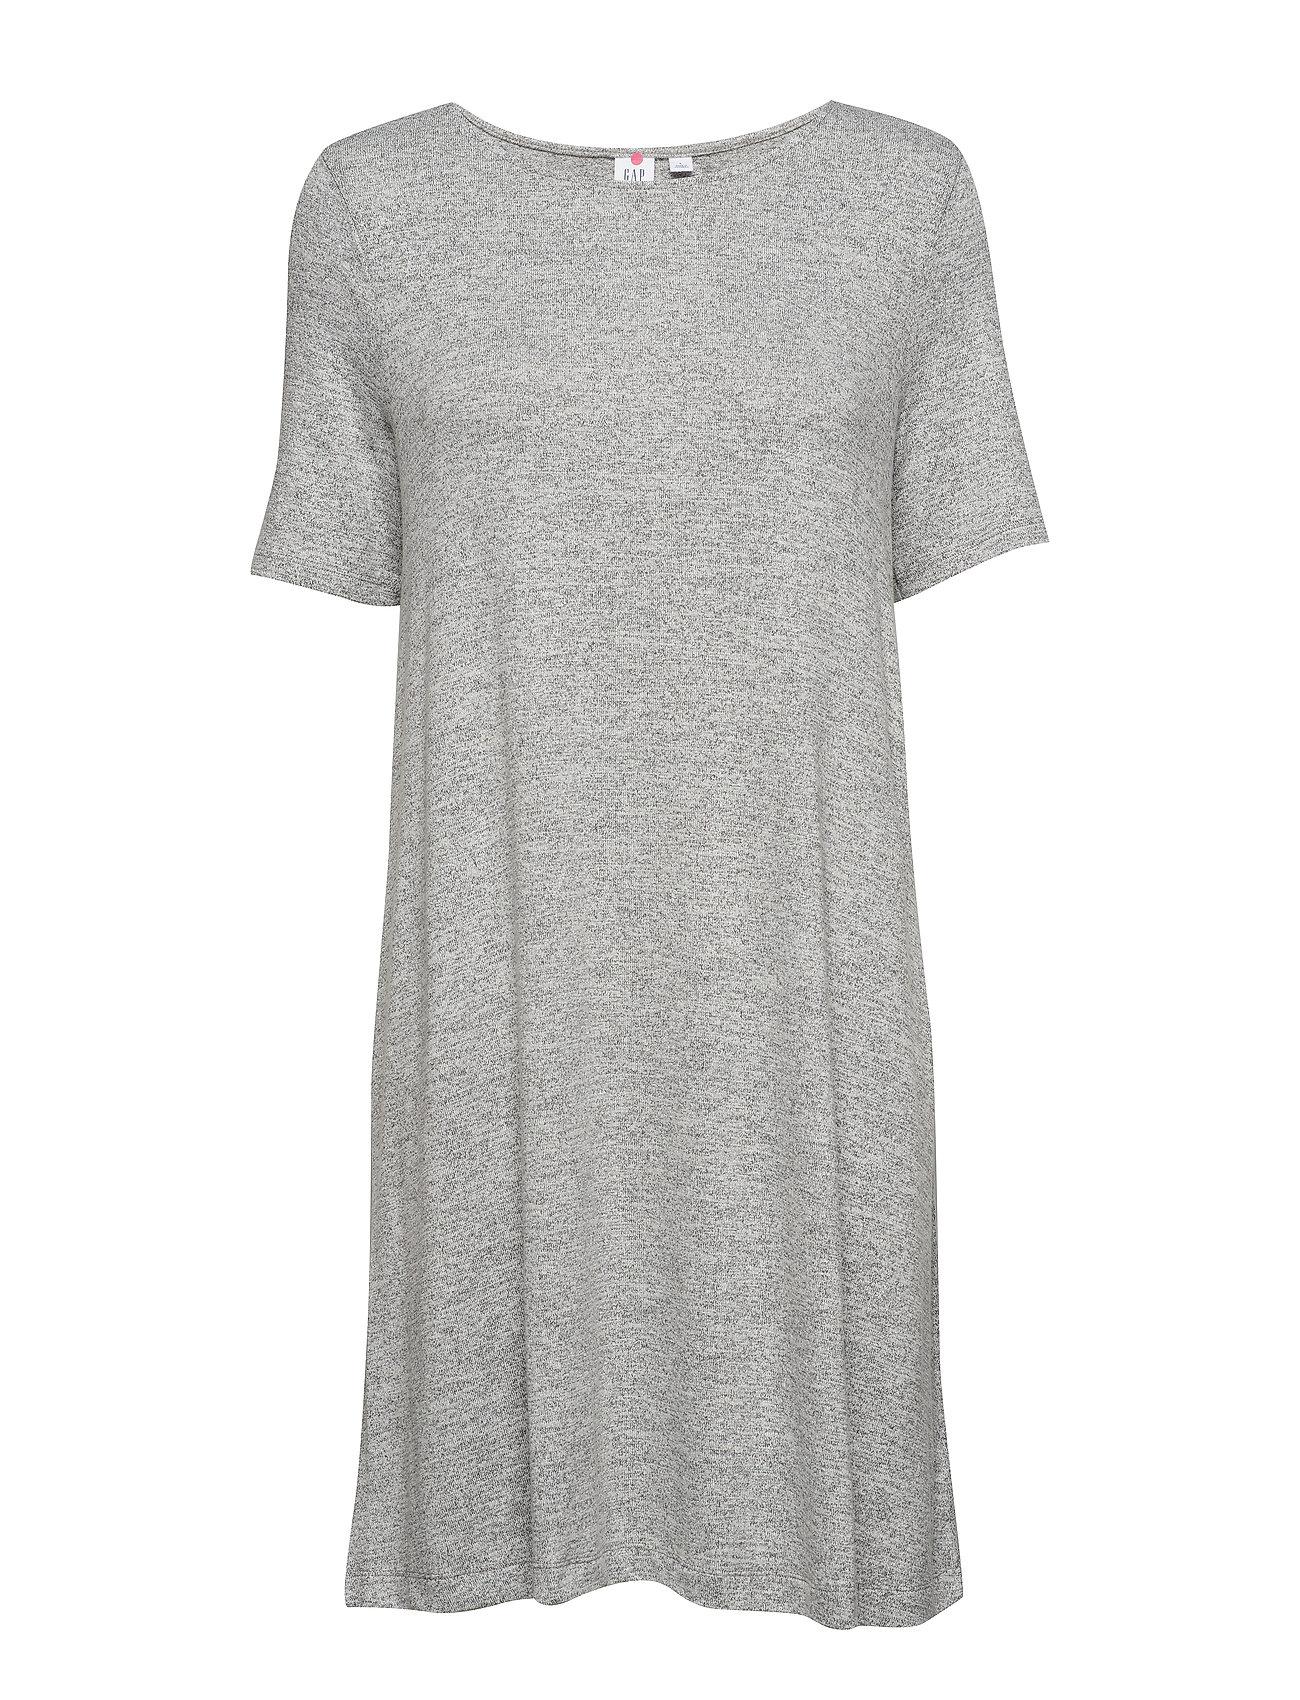 GAP Softspun Short Sleeve Swing Dress - LIGHT GREY MARLE